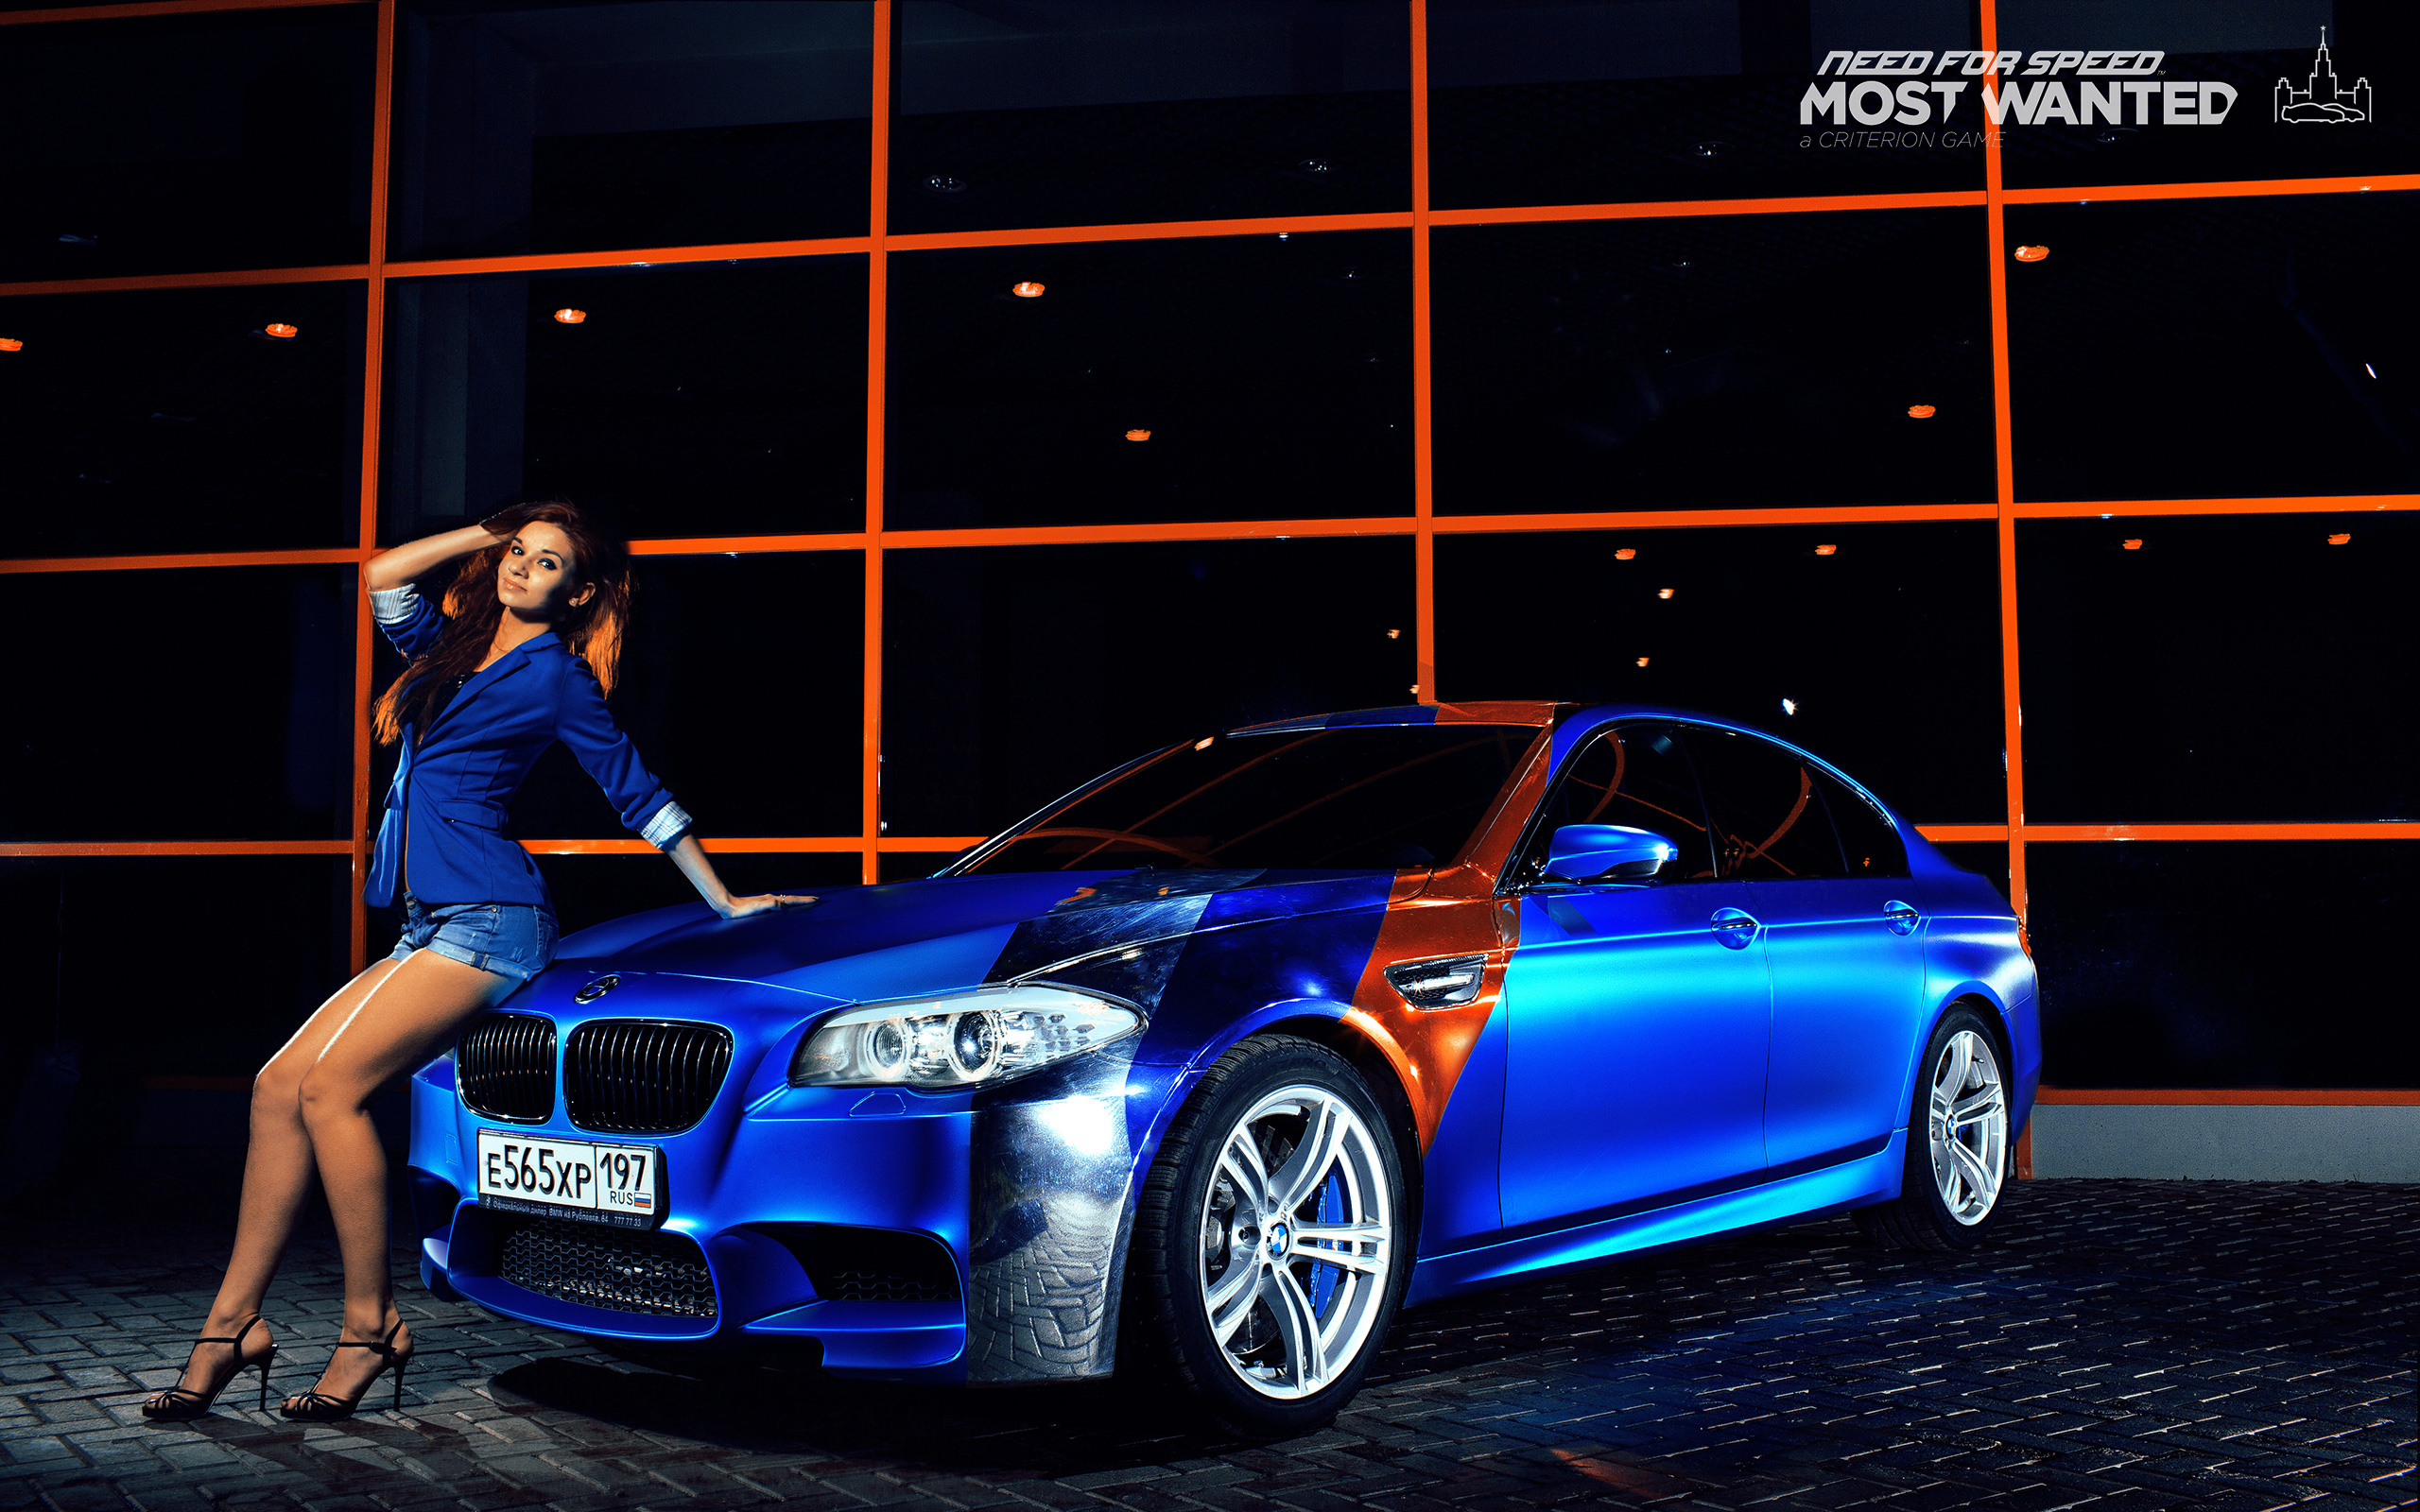 Wallpaper Bmw M5 Blue Girls Cars 2560x1600